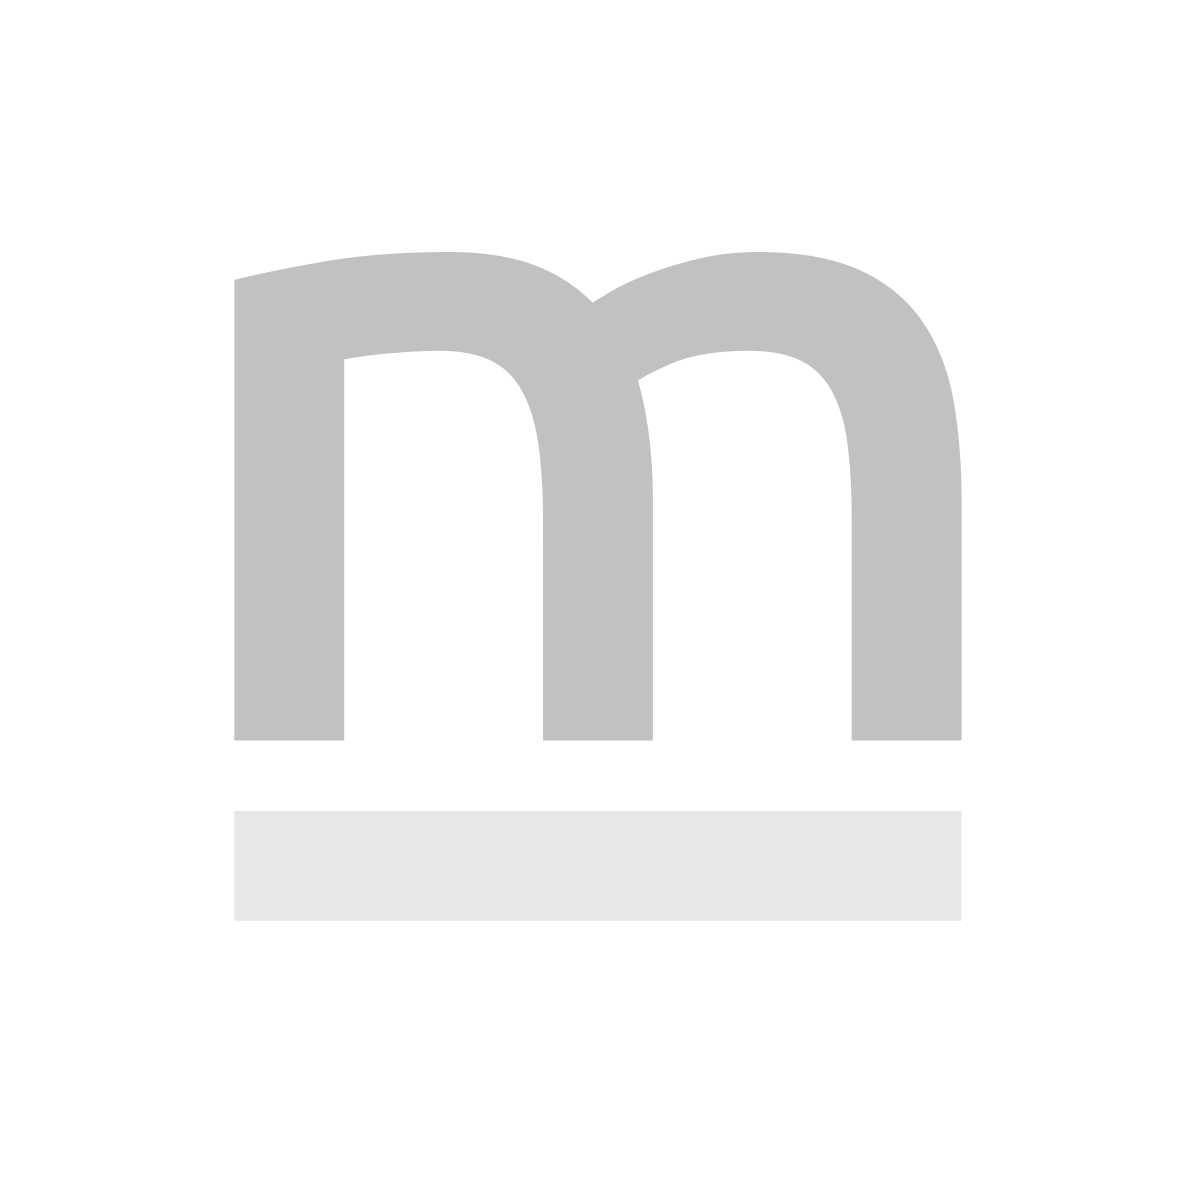 Łóżko MODENA 3 160x200 ciemno zielone velvet